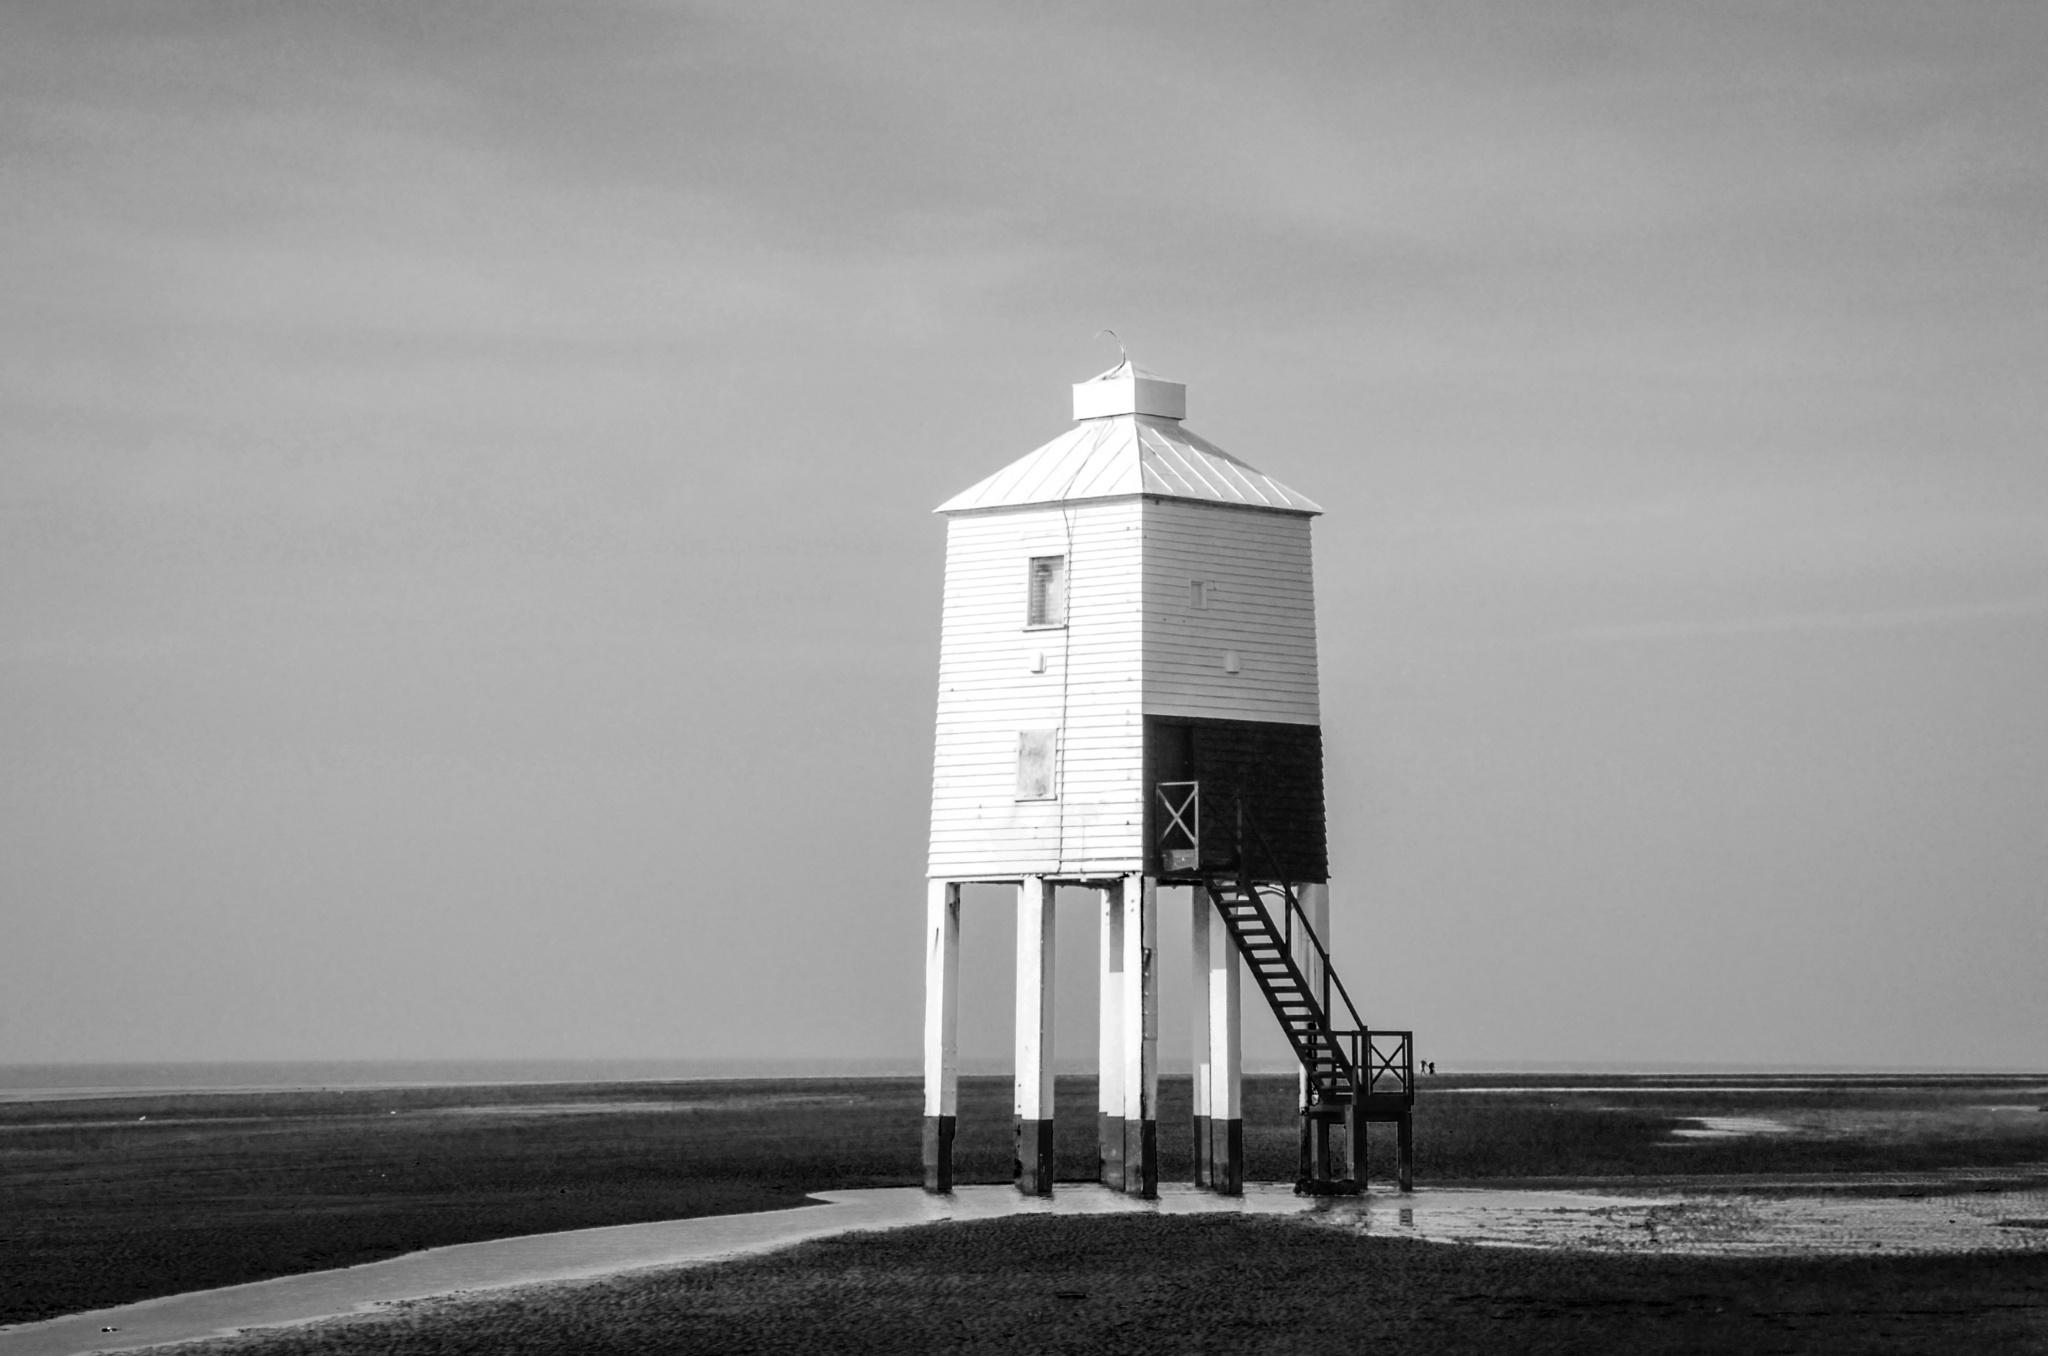 Lighthouse by Tony Bridges